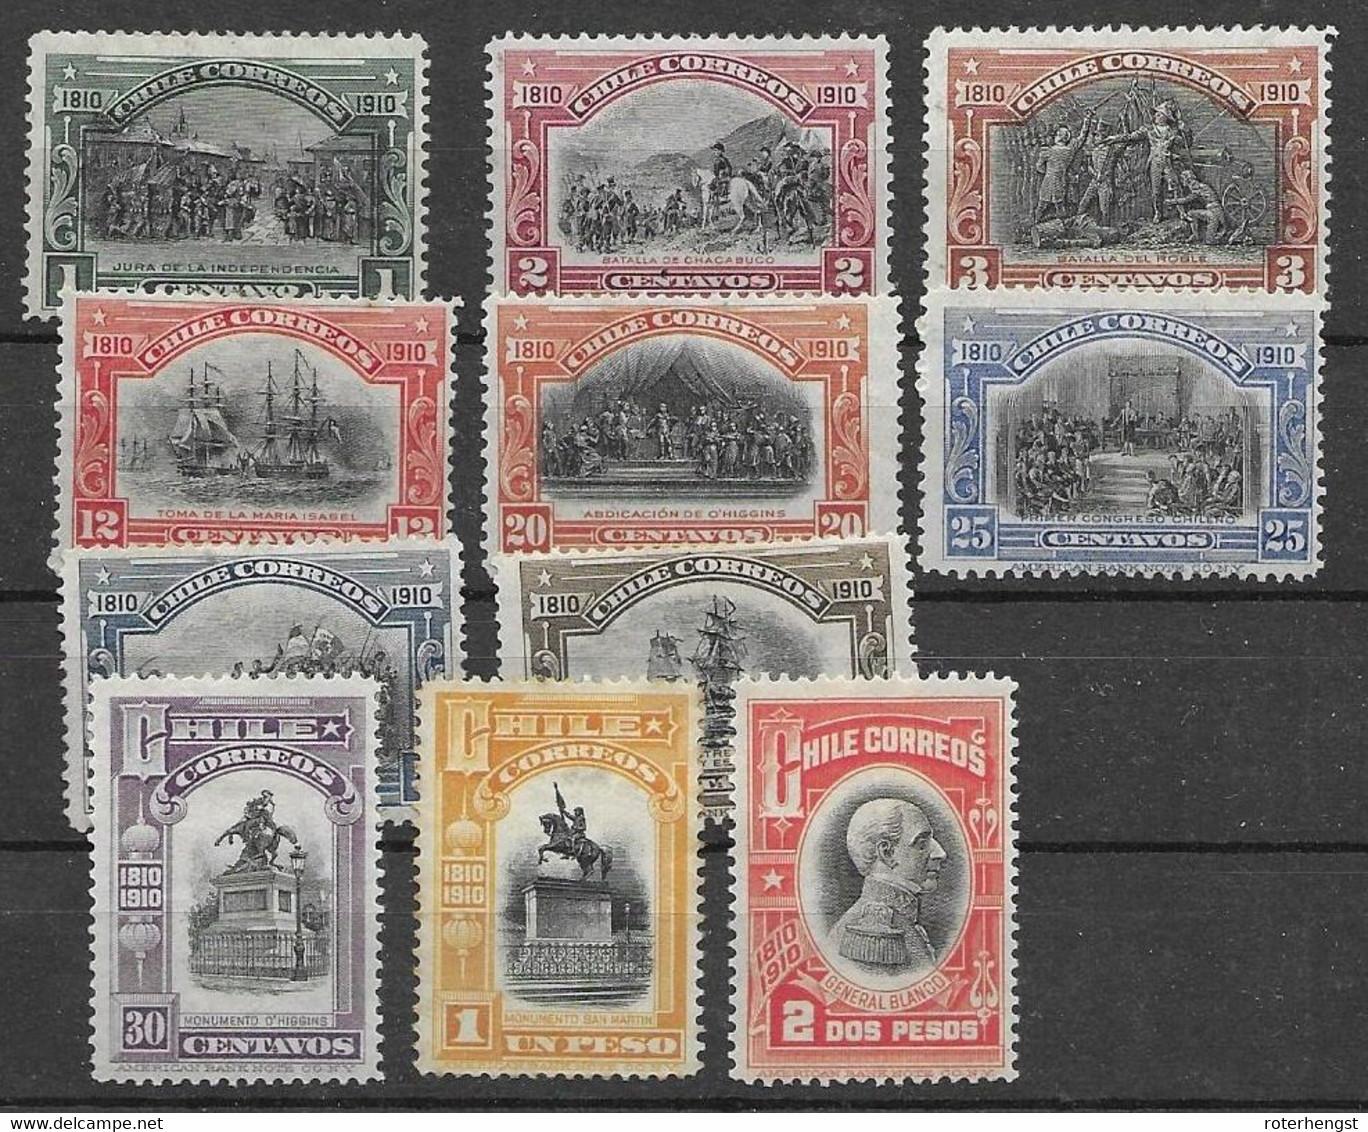 Chile 1910 Short Set 85 Euros Mh * - Chile